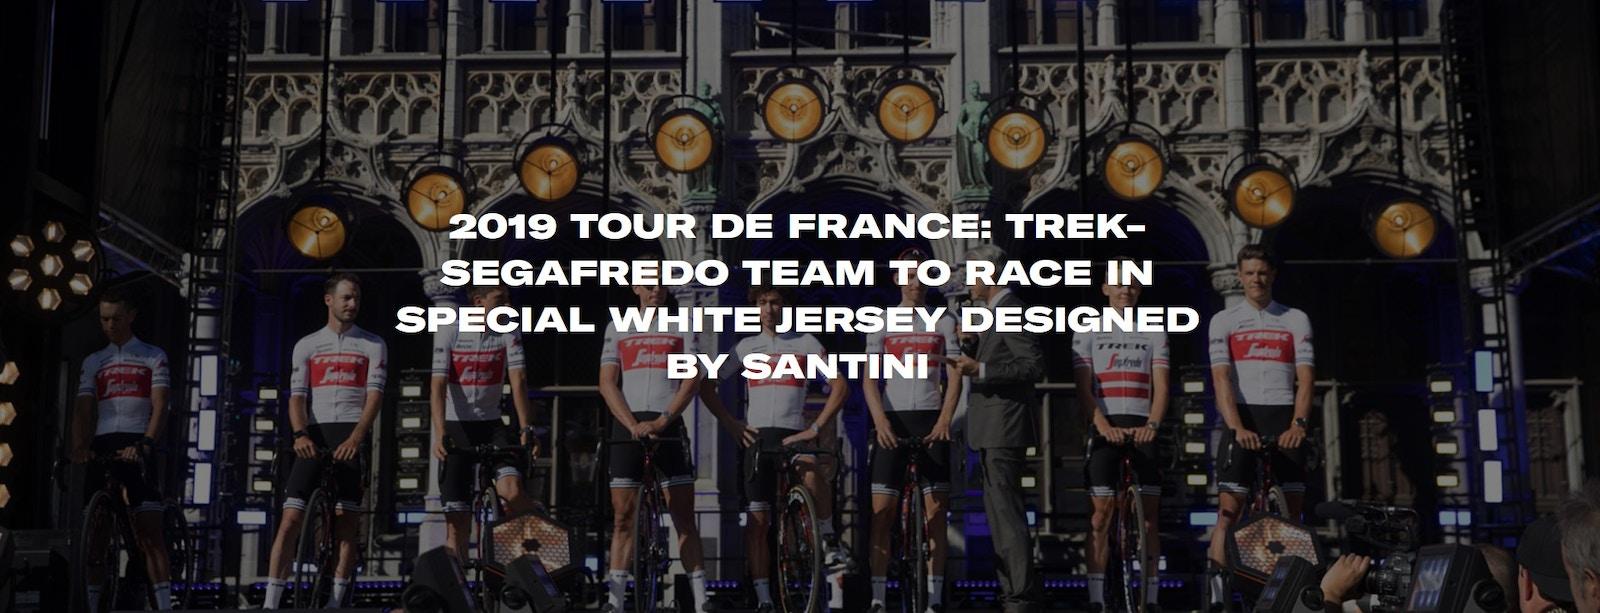 2019 TOUR DE FRANCE: TREK-SEGAFREDO TEAM TO RACE IN SPECIAL WHITE JERSEY DESIGNED BY SANTINI